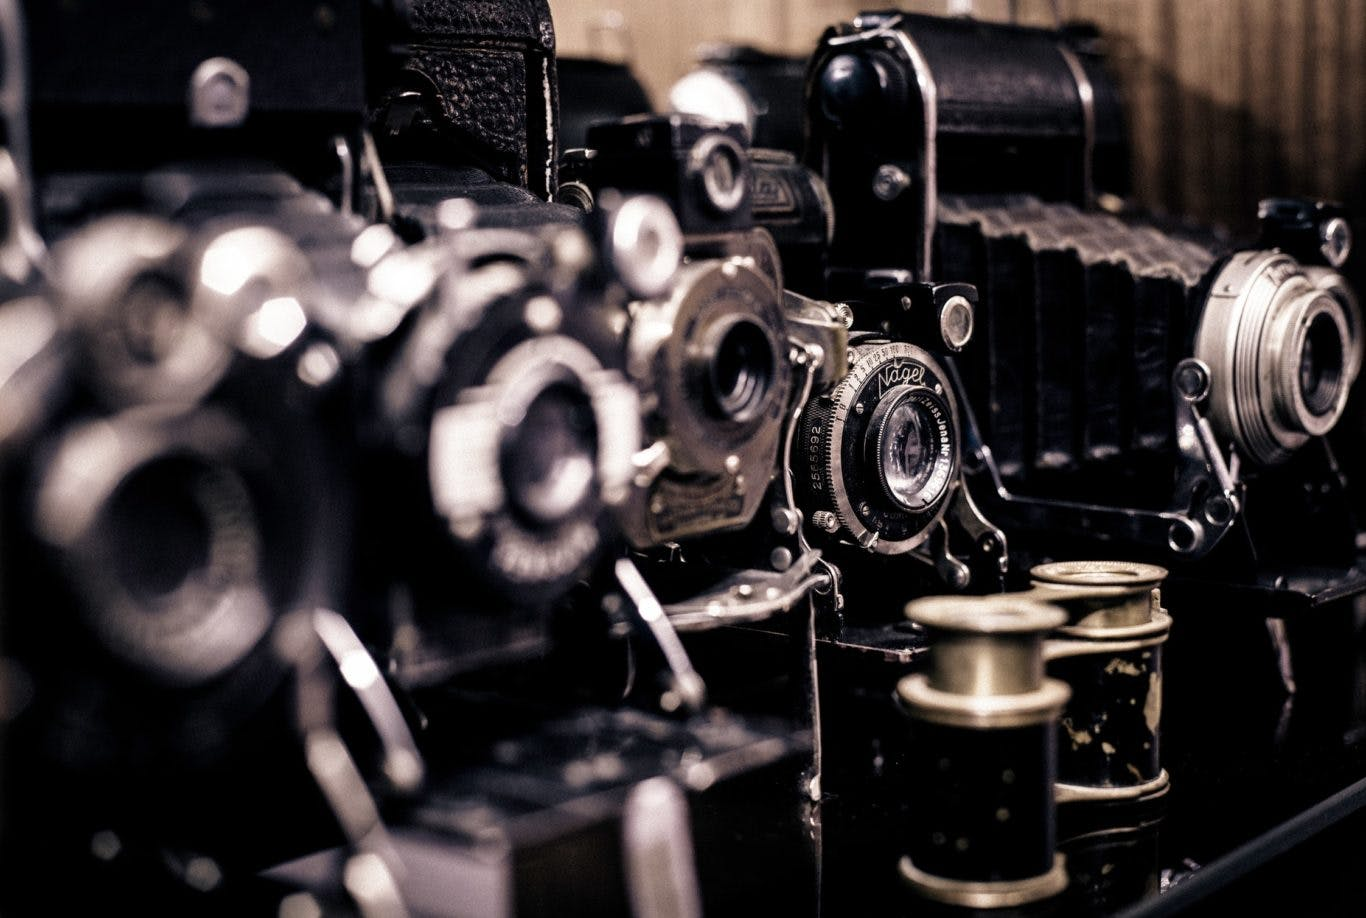 Close up shot of a vintage camera